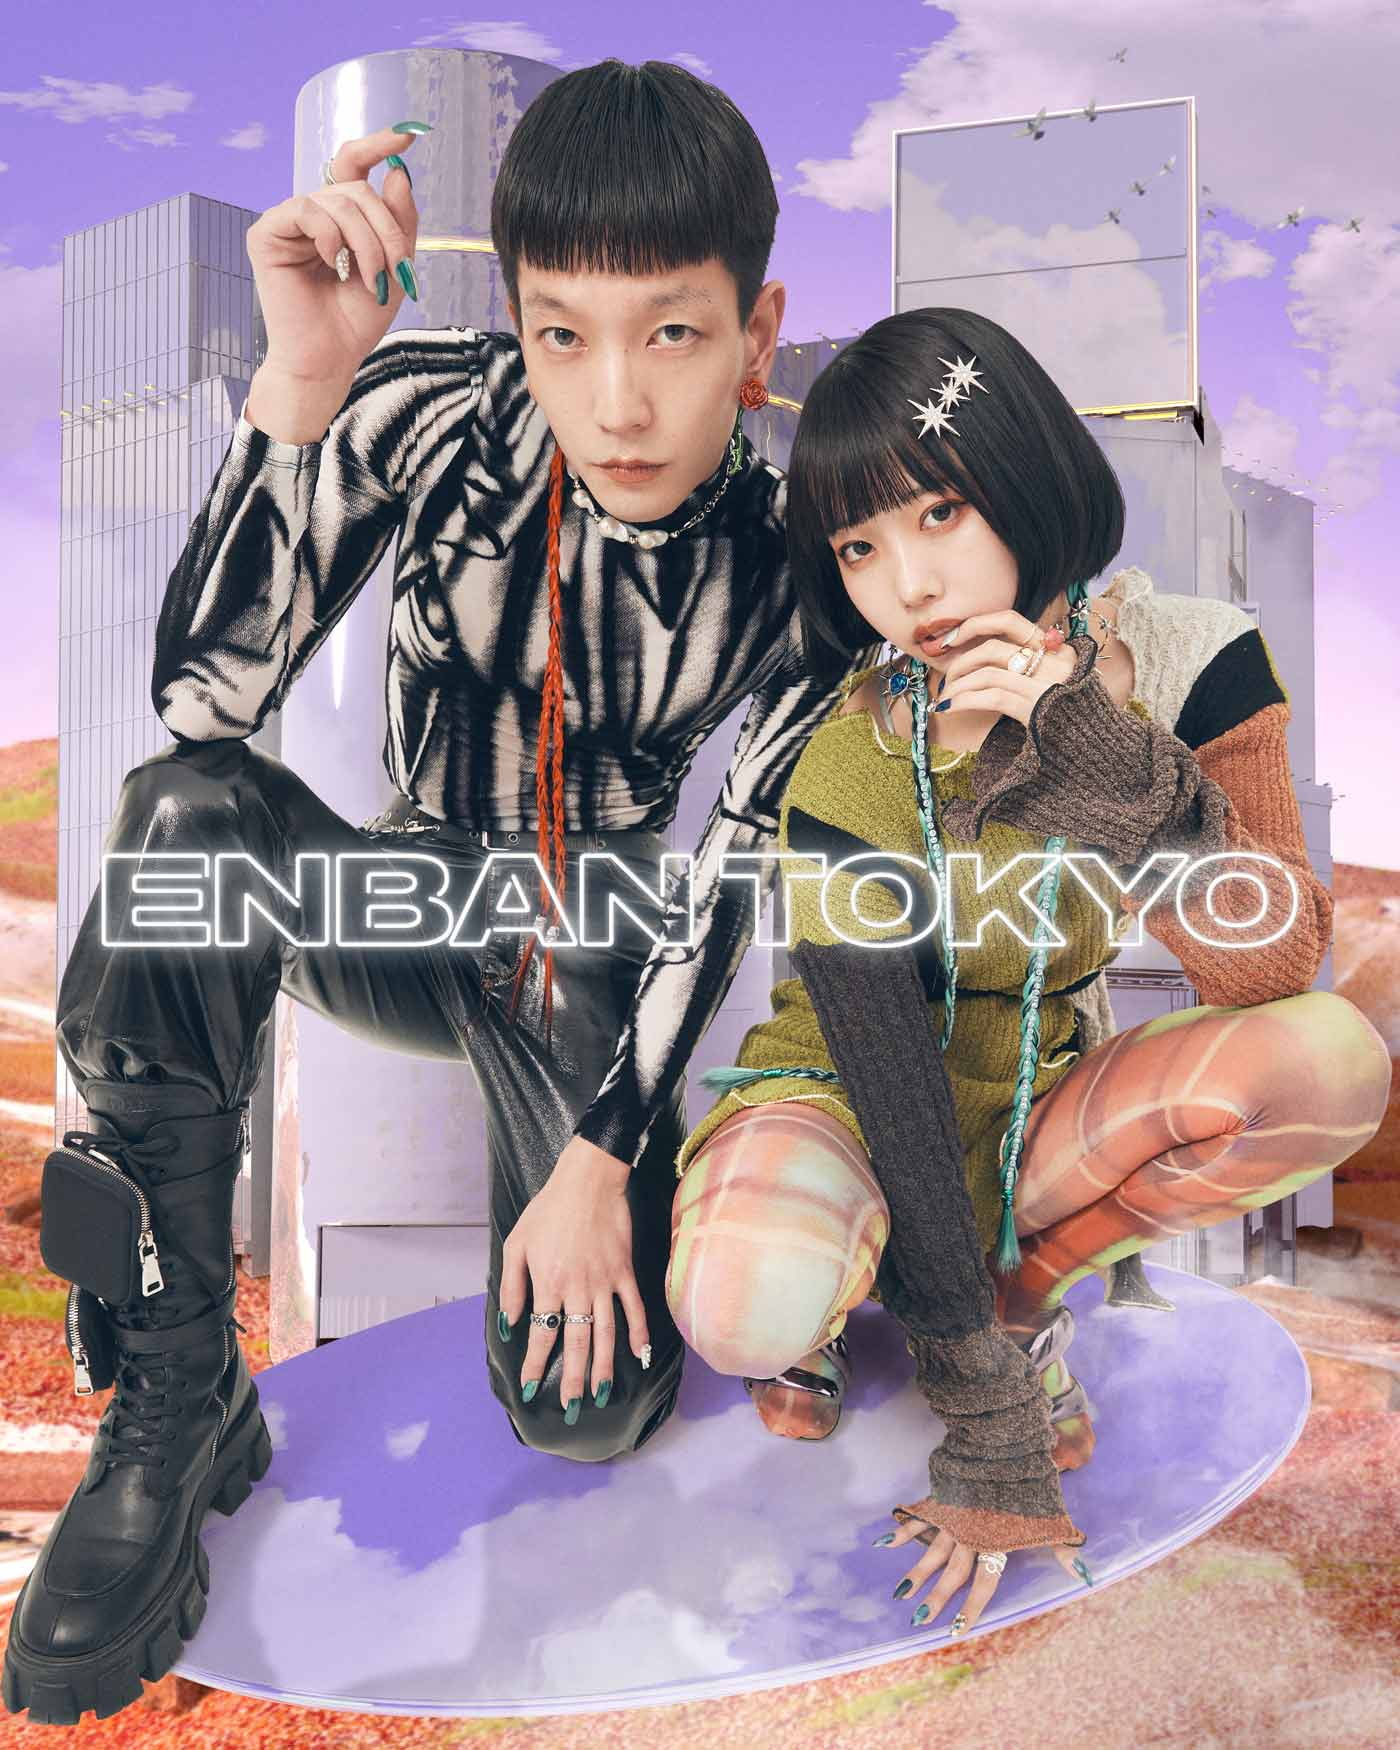 ENBAN TOKYO